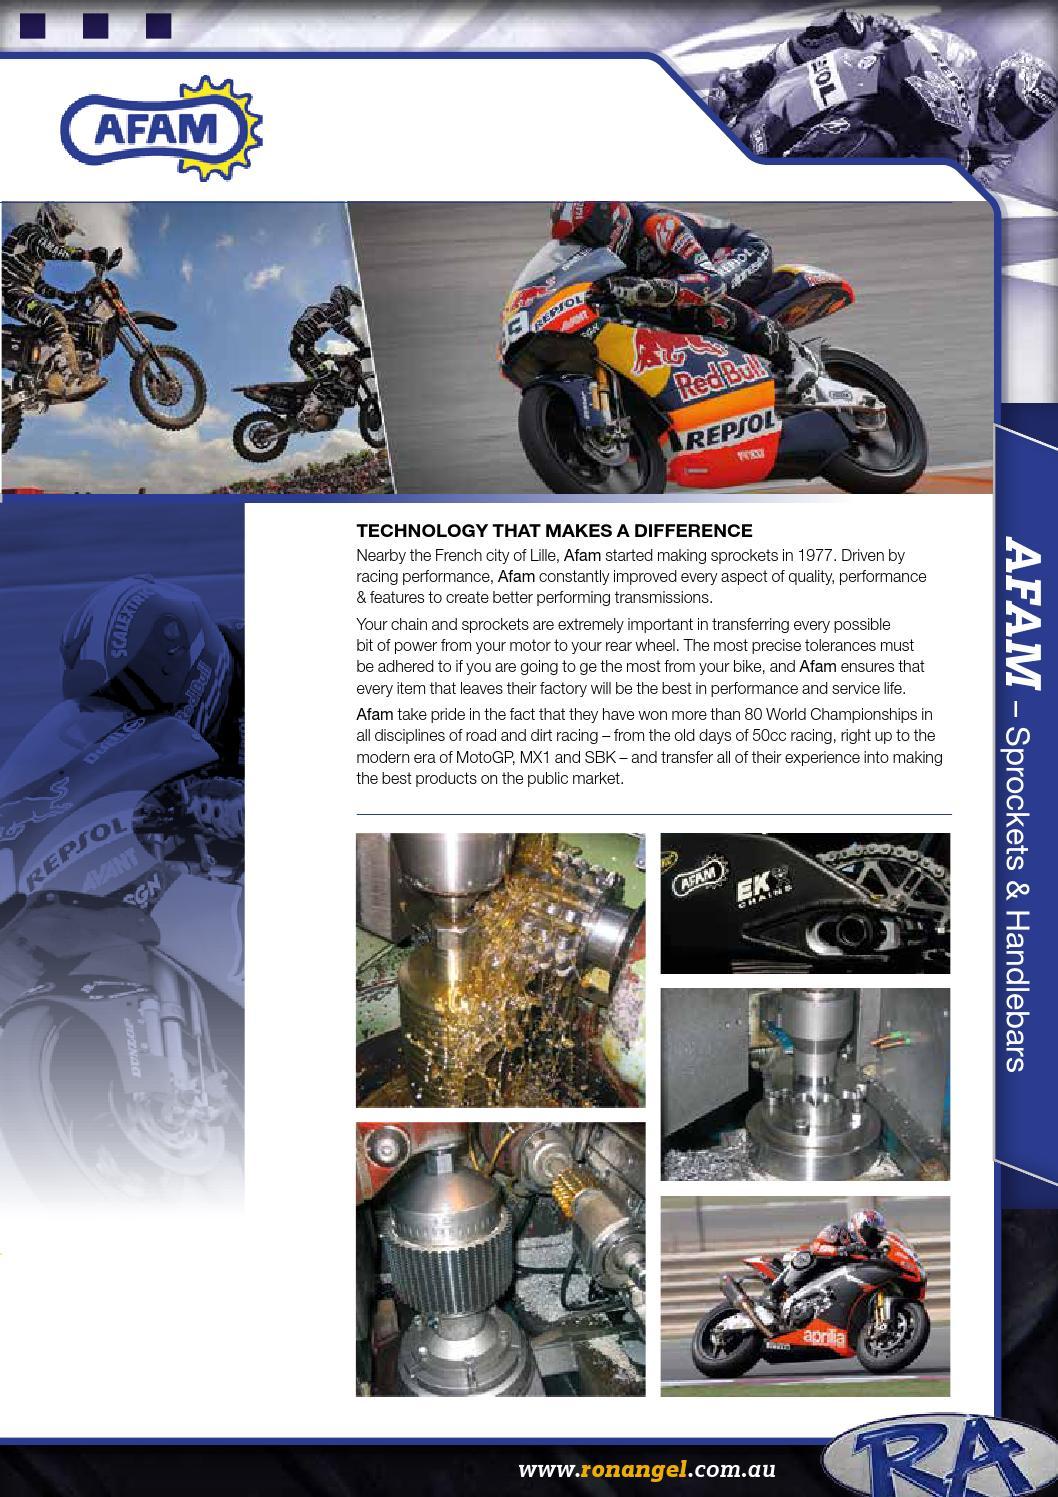 New Red Motocross Enduro Handlebars Yz Cr Crf Rm Kx Yzf Kxf Fmx Ktm Dt Xr Nx Mtx